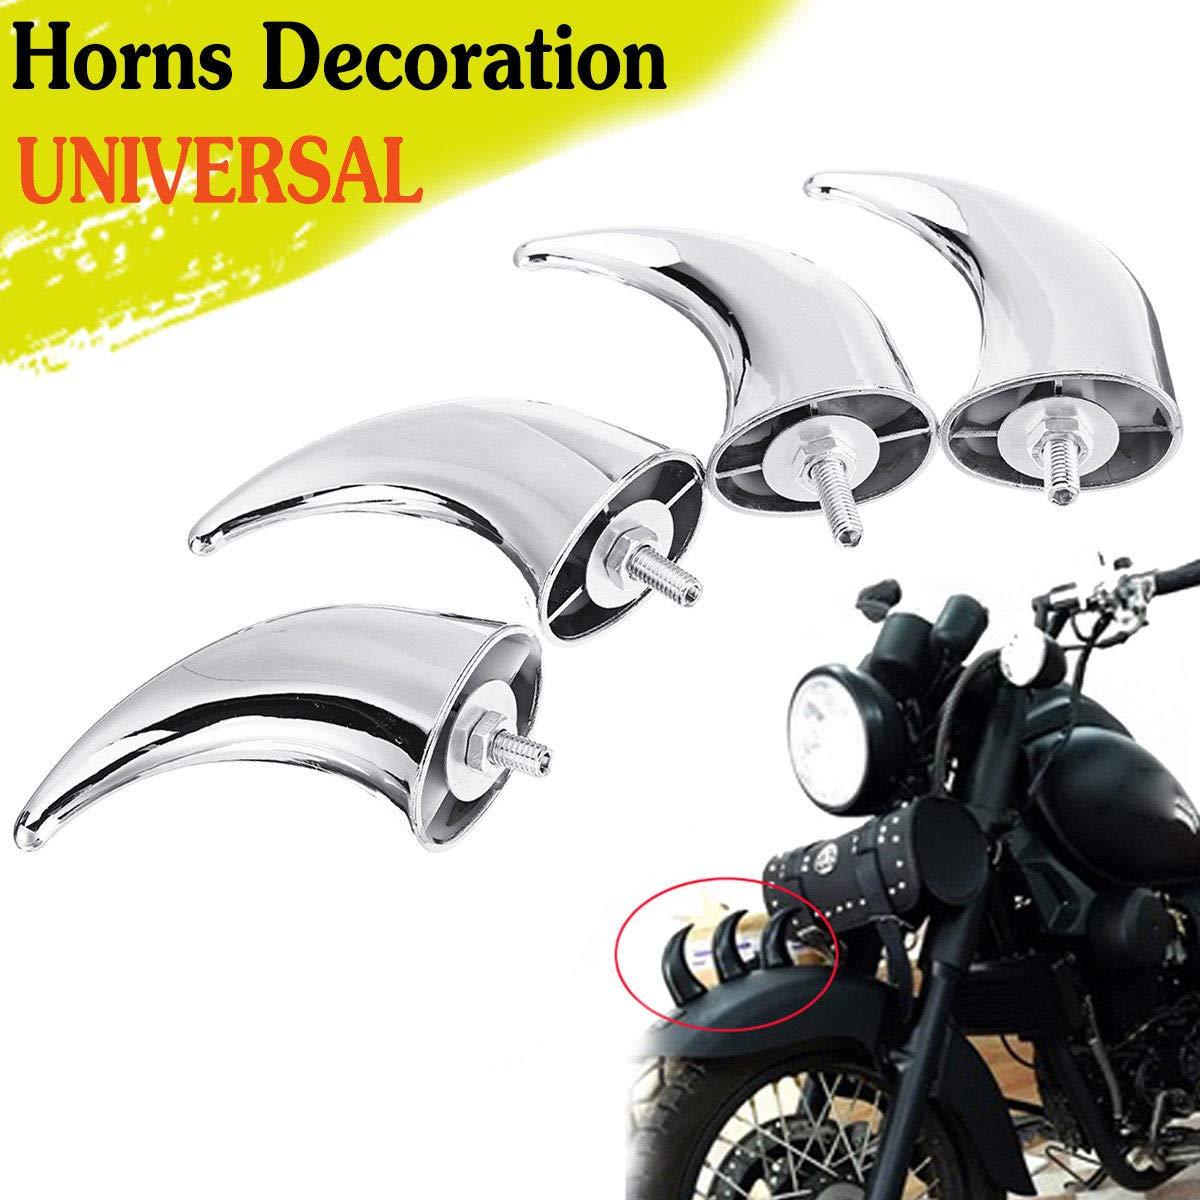 Fittings Motorcycle Black Front Fender Horns Decoration for Harley Chopper Bobber Touring Cafe Racer Custom